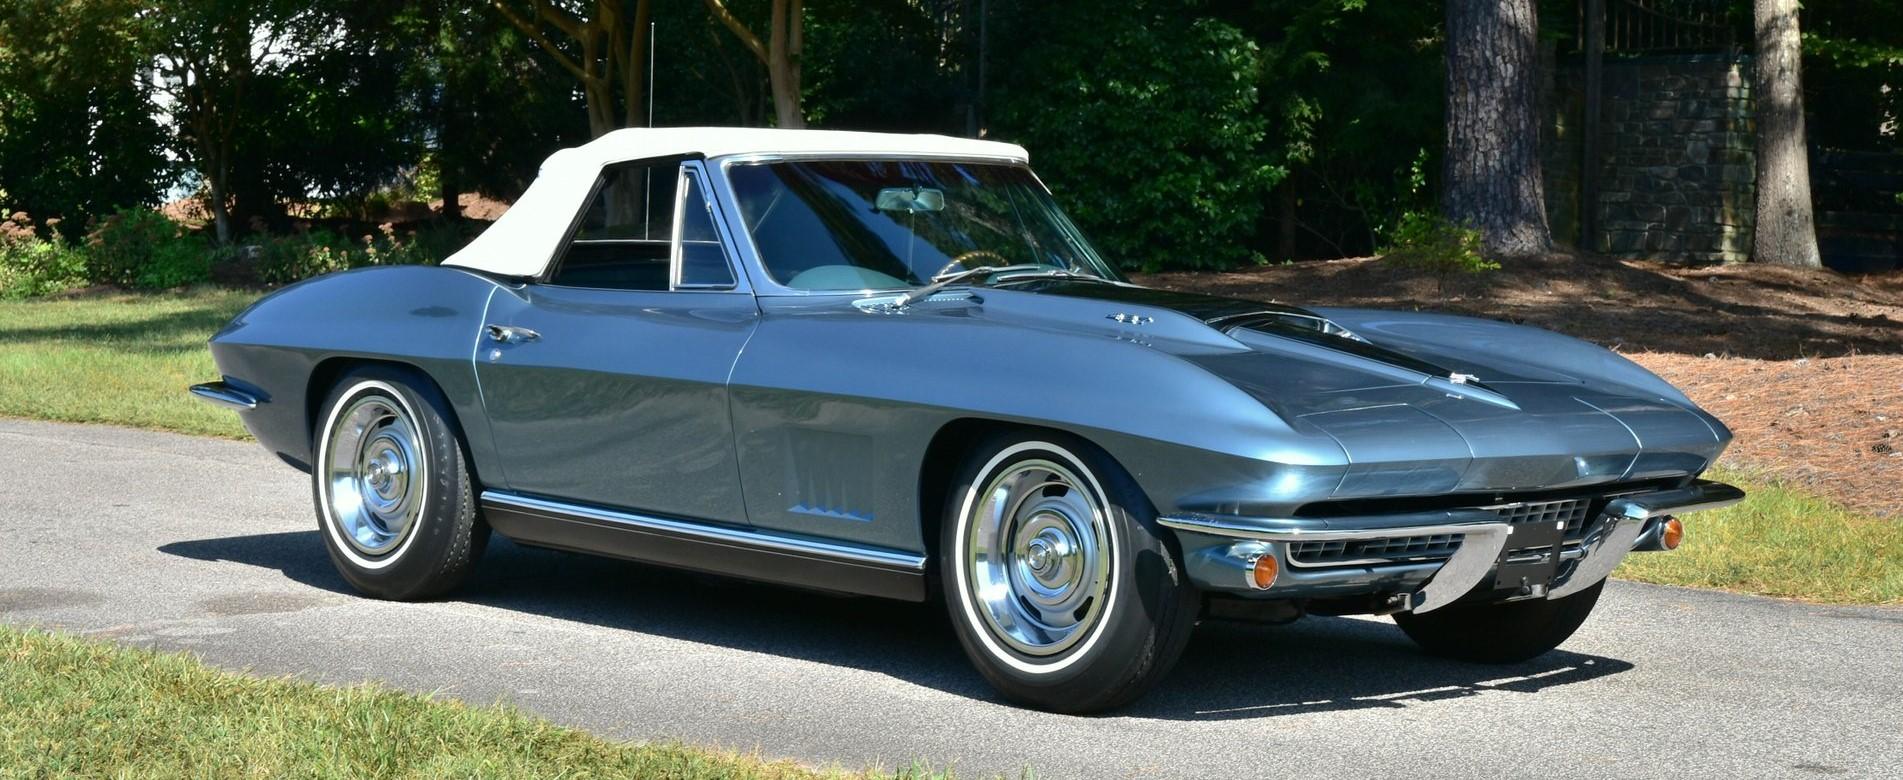 1967 Chevrolet Corvette Raleigh Classic Auction